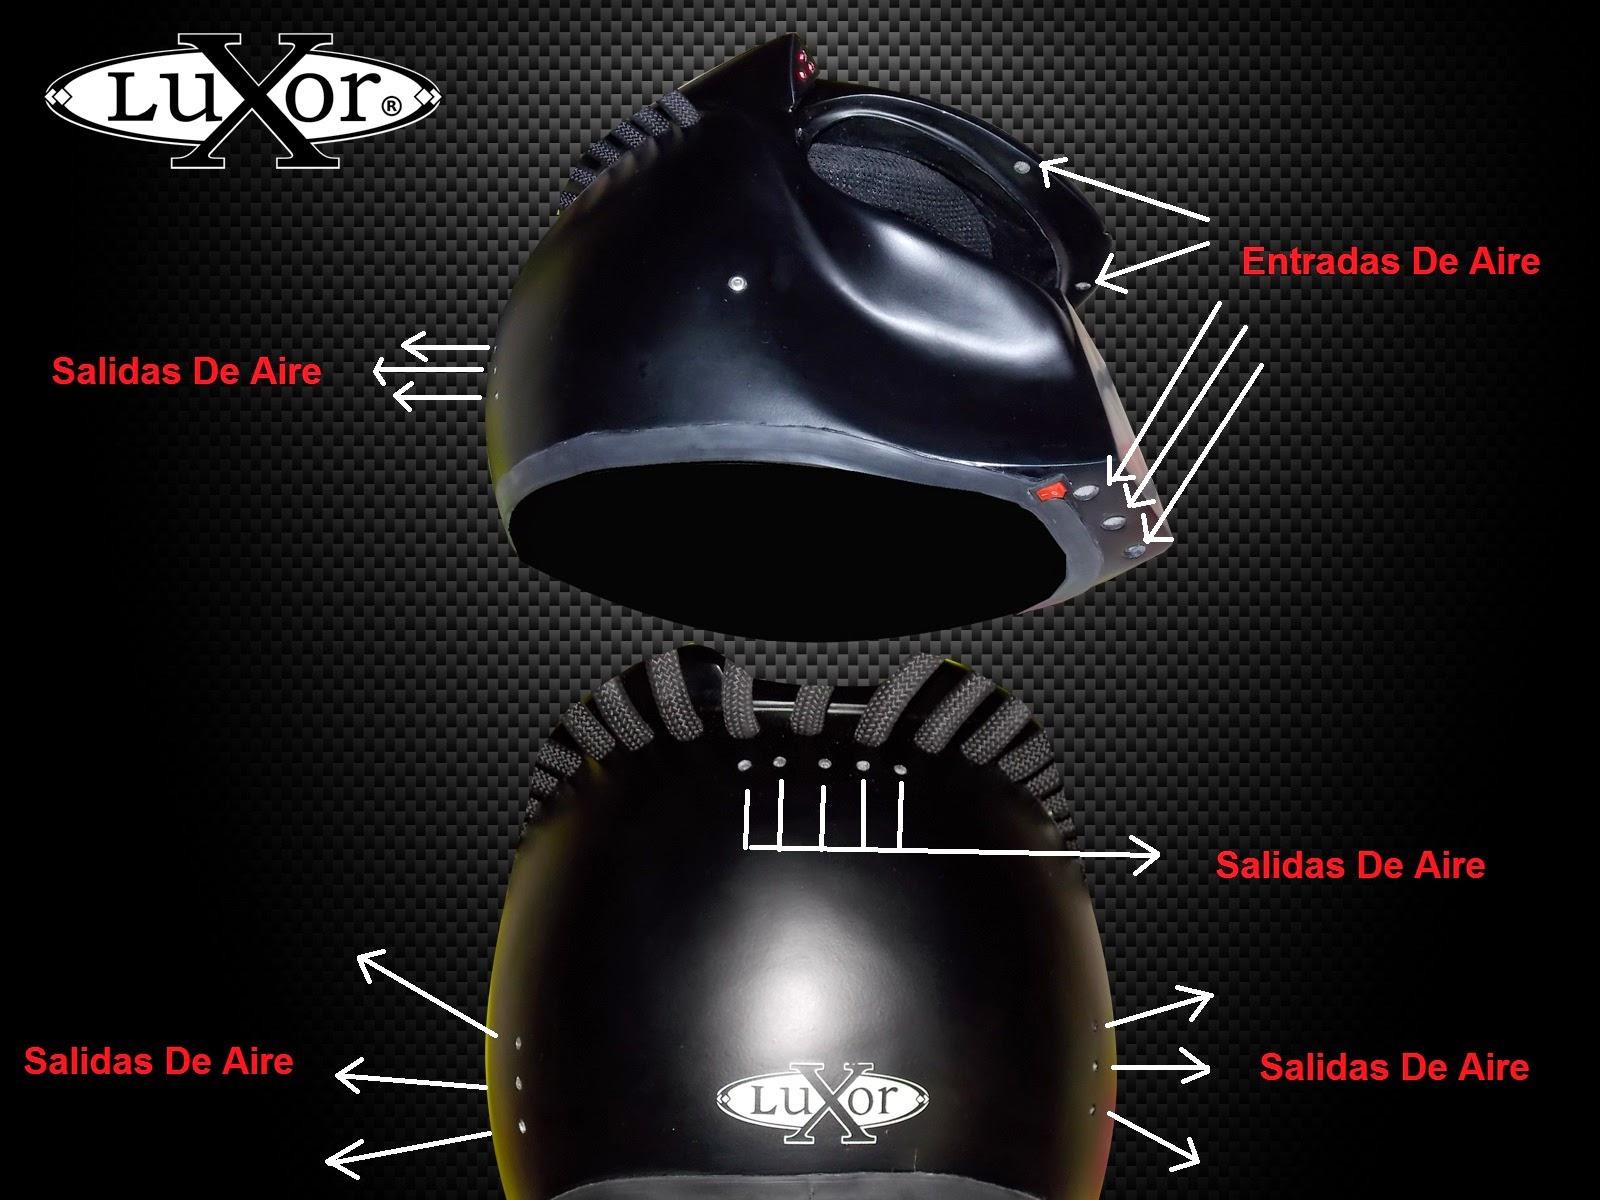 Casco Depredador Para Moto Caracteristicas